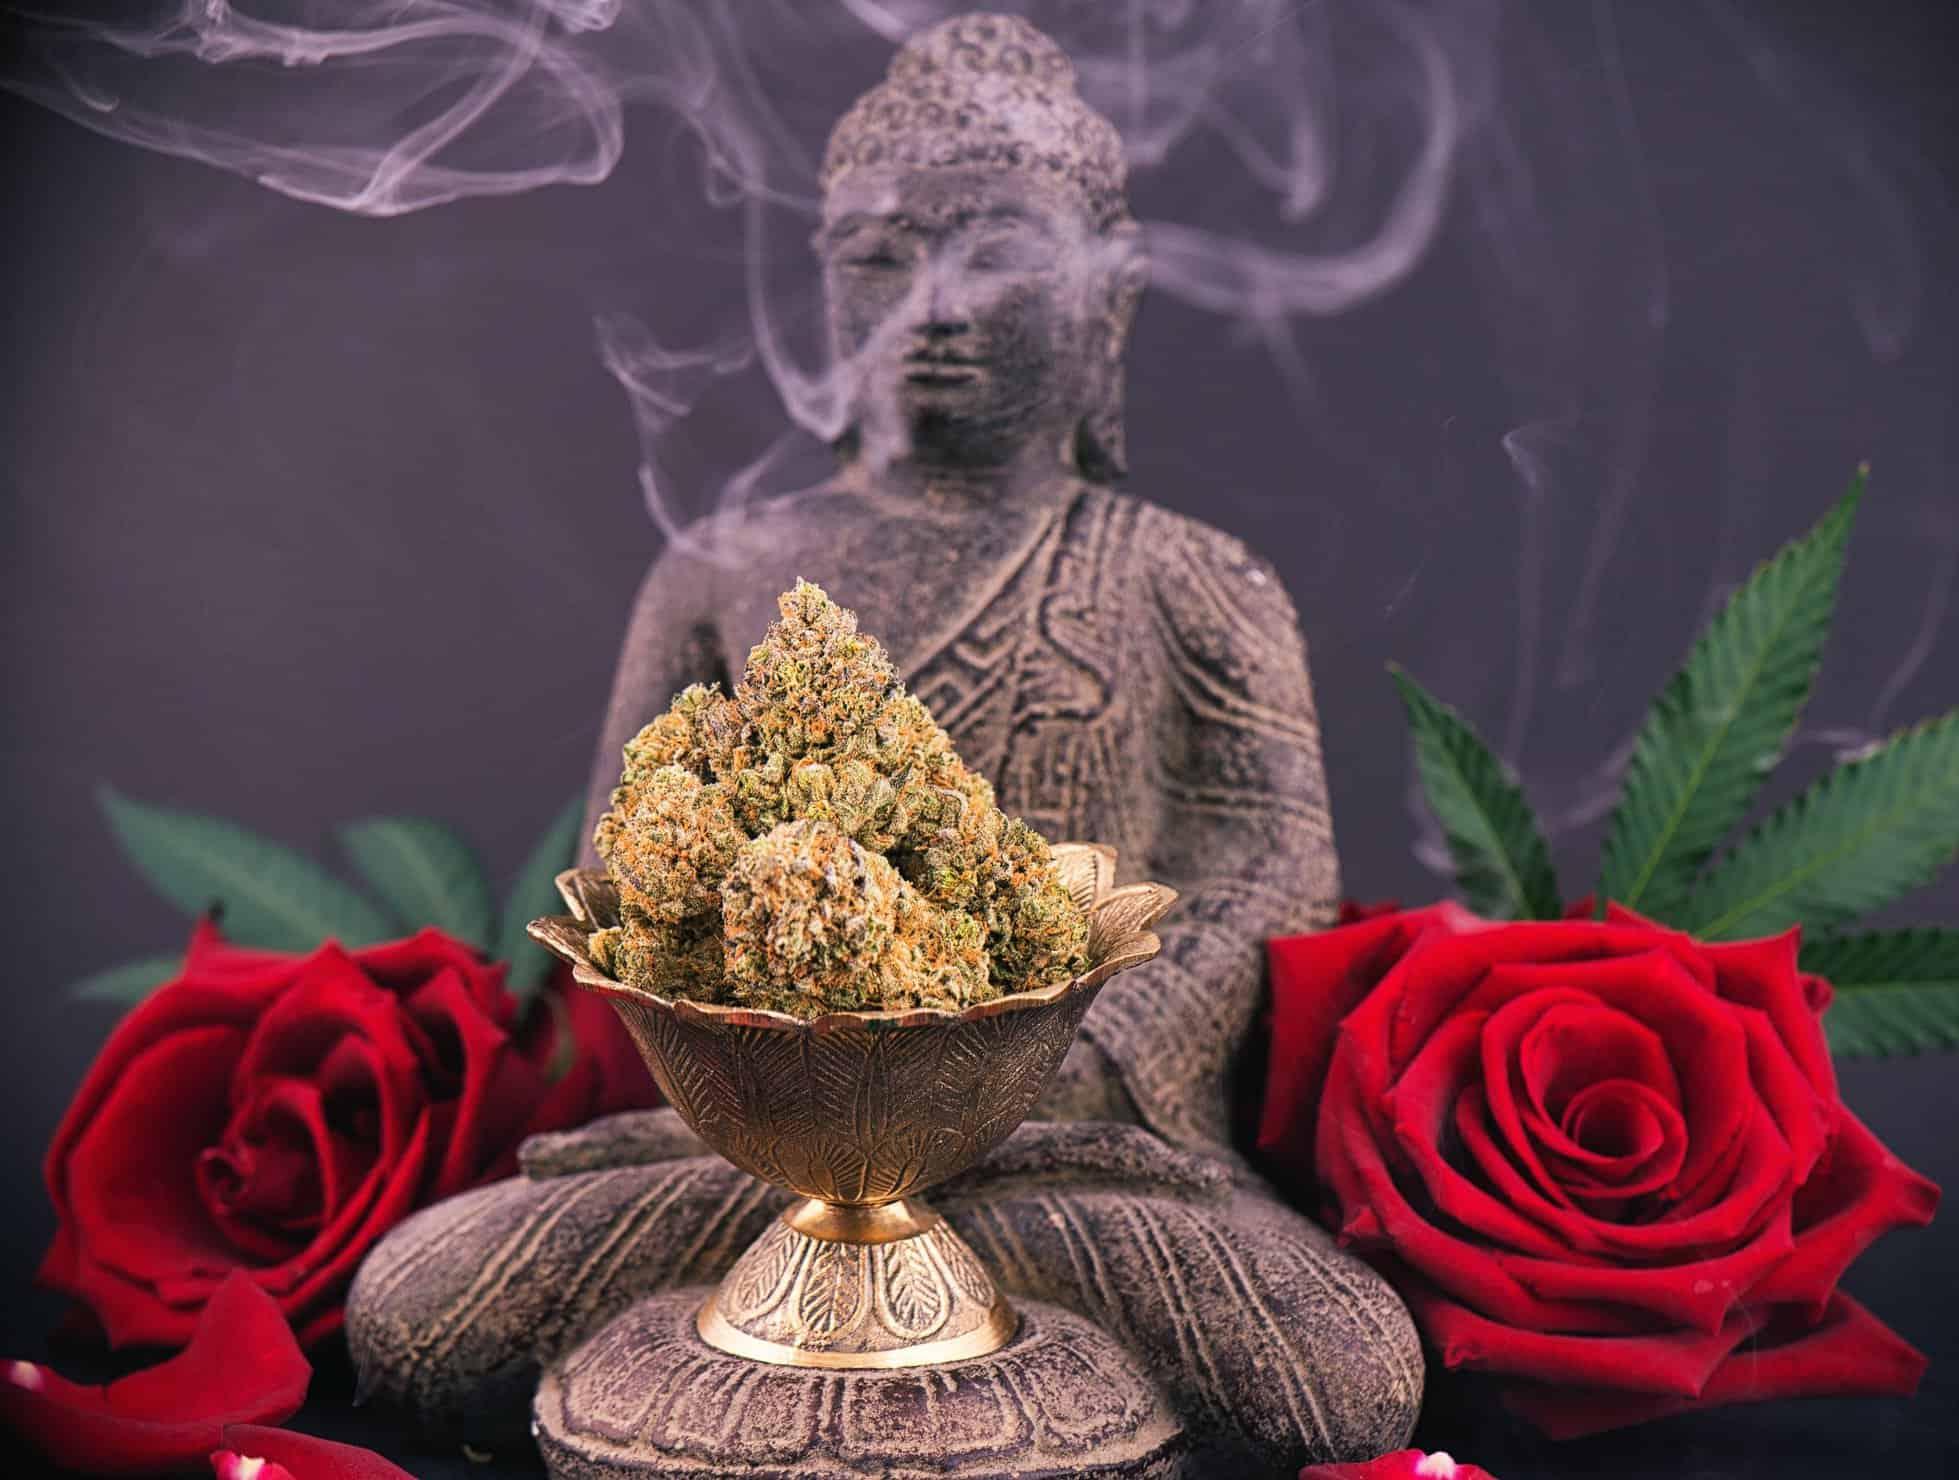 Benefits of Consuming Cannabis While Meditating. Buddha with marijuana and roses.